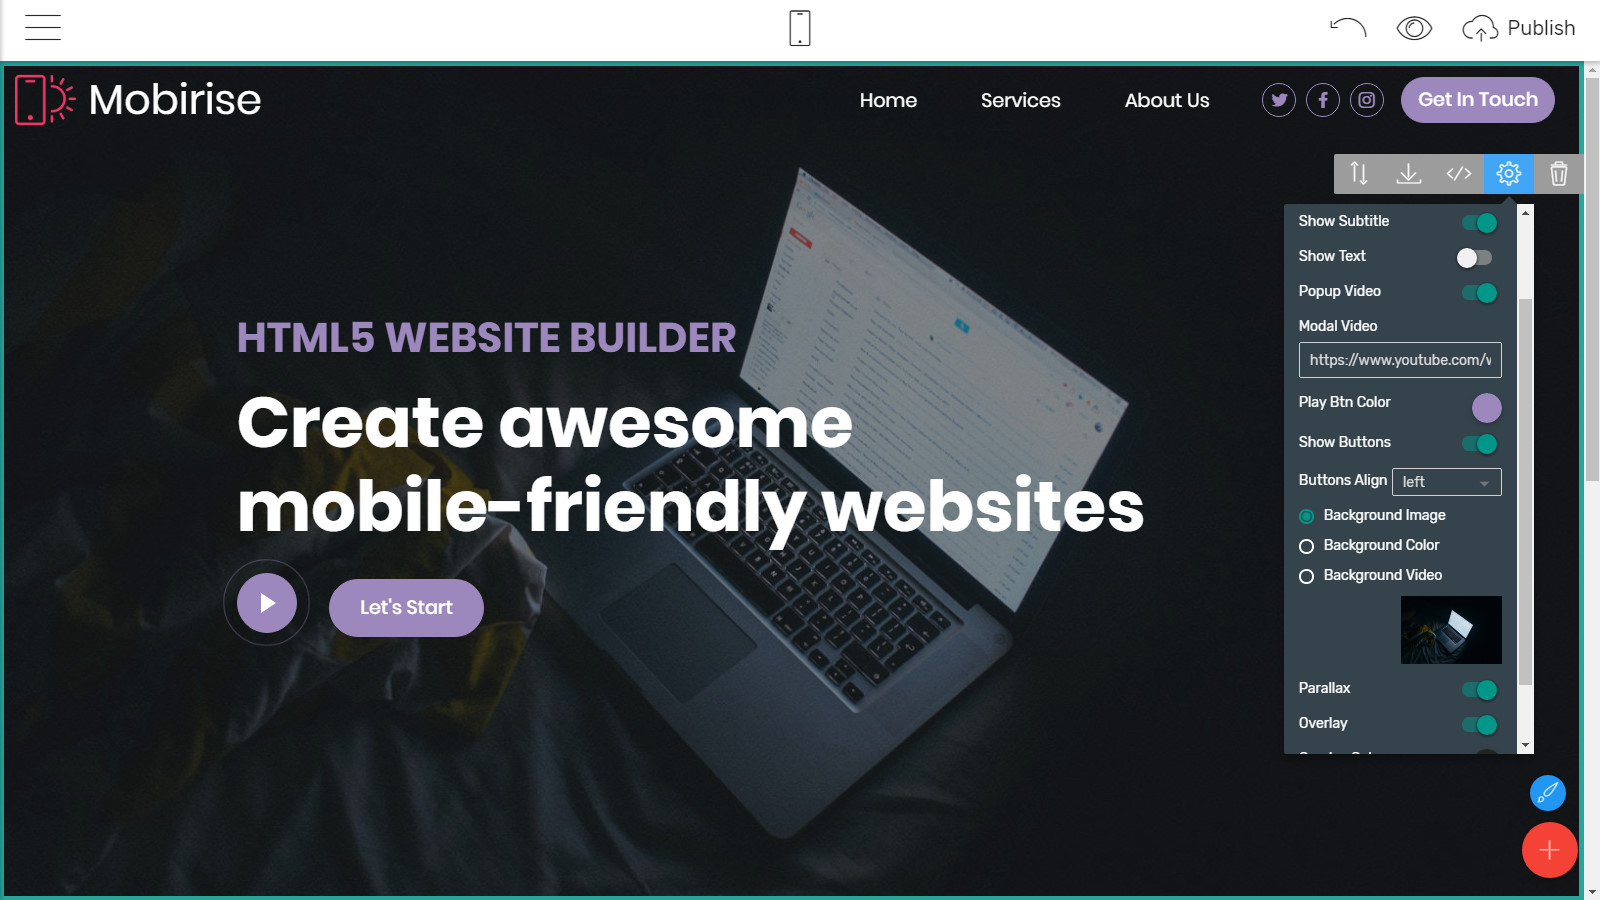 mobile-friendly webpage themes